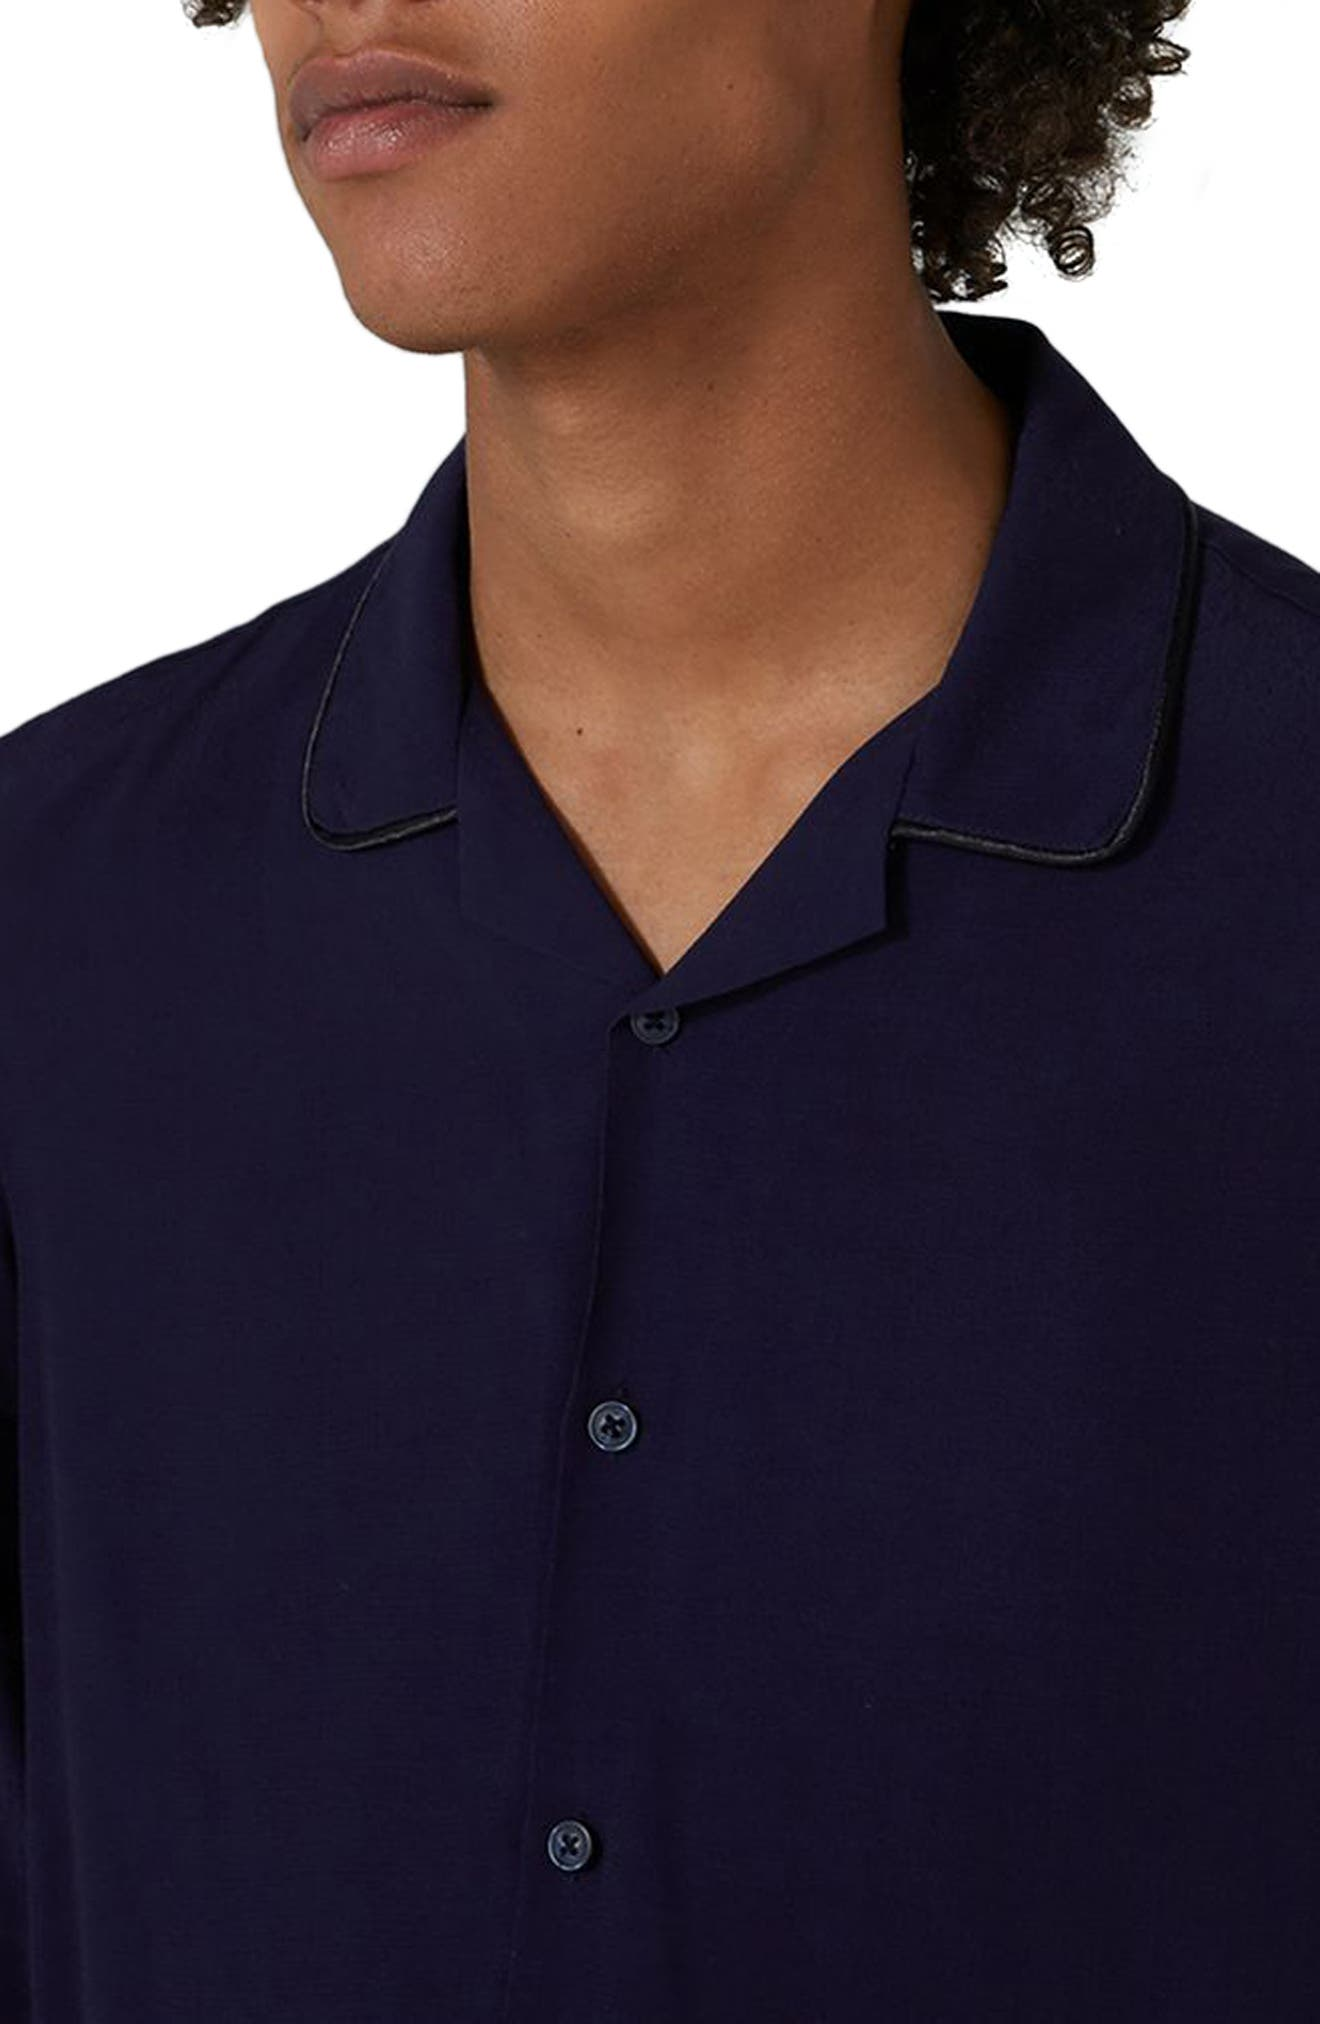 Piped Crepe Shirt,                             Alternate thumbnail 3, color,                             410